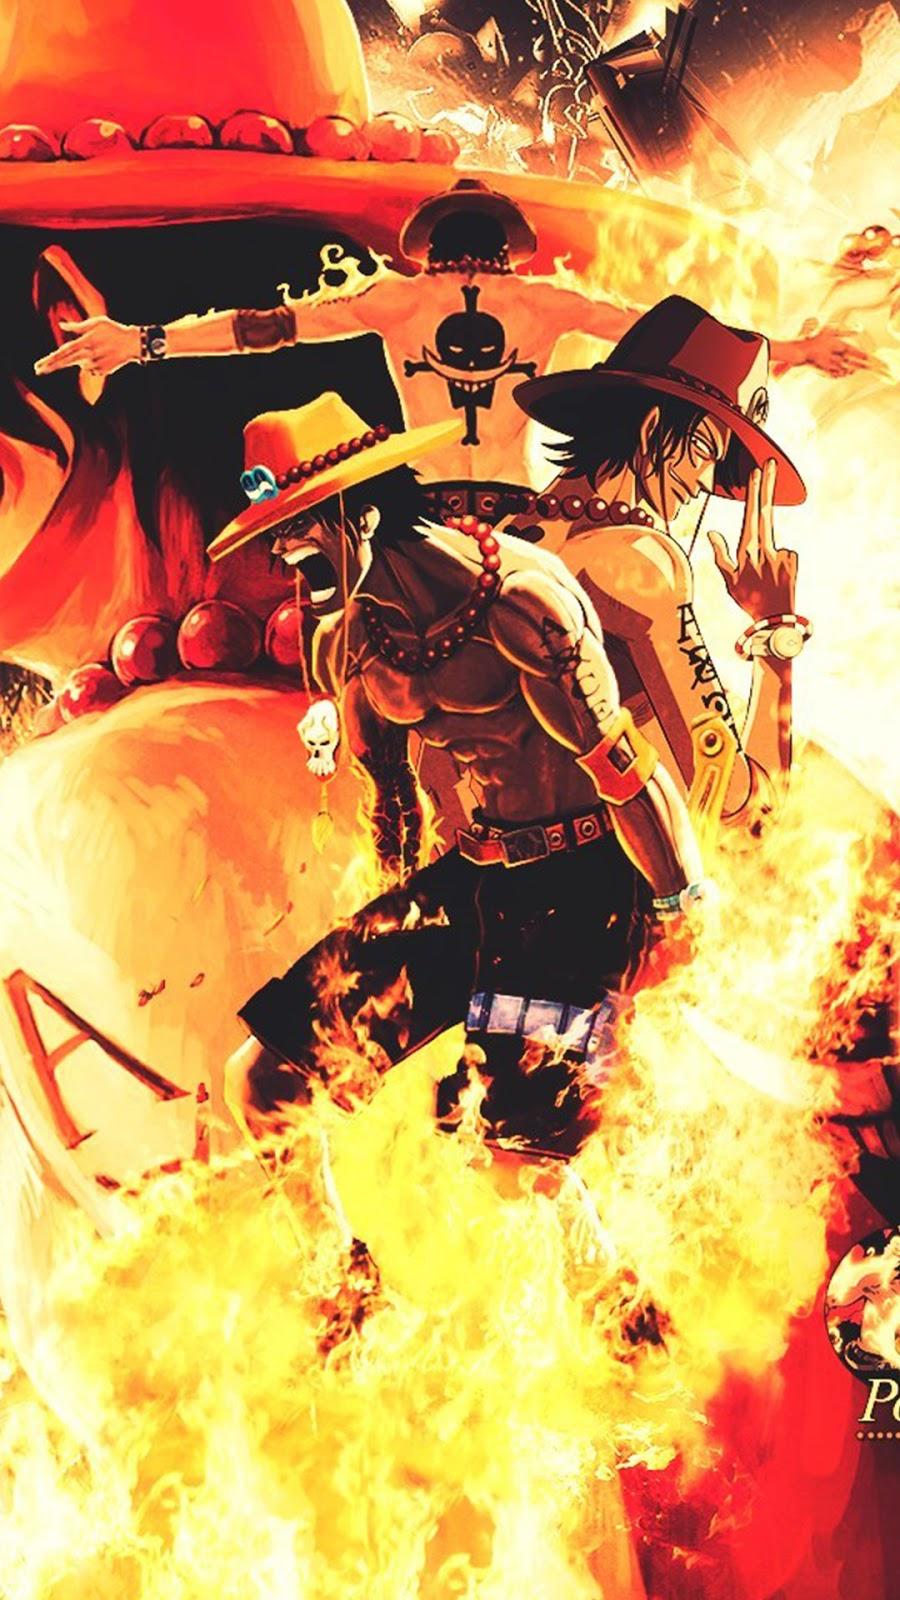 18 Wallpaper One Piece Android Kualitas HD Terbaru